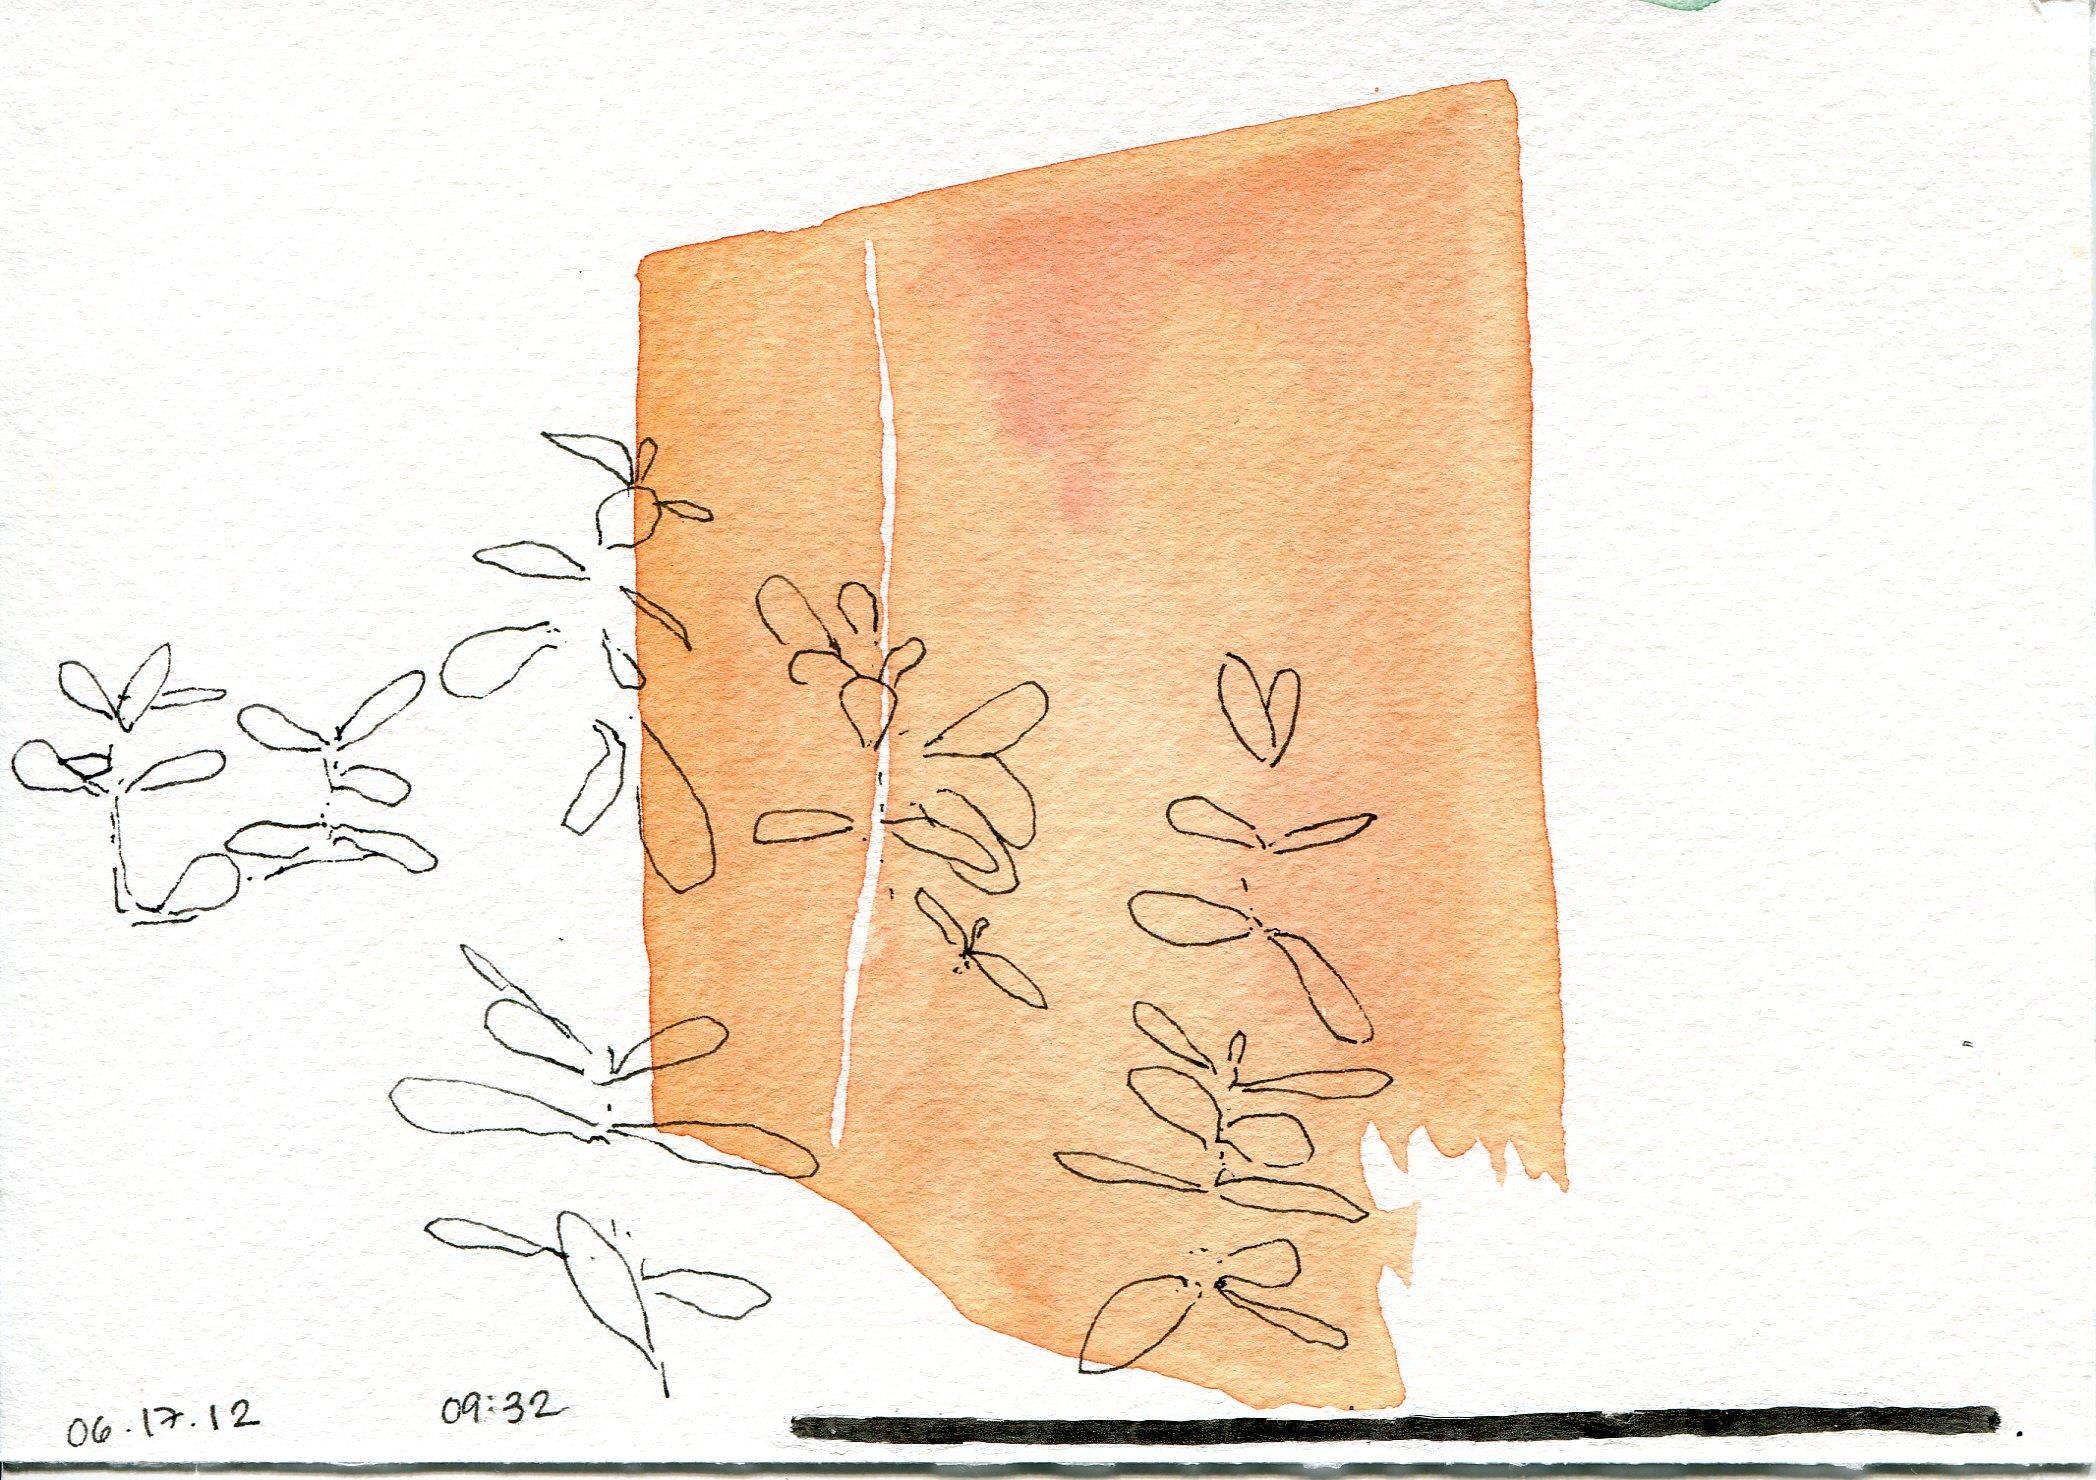 2012-06-23 drawing001.jpg